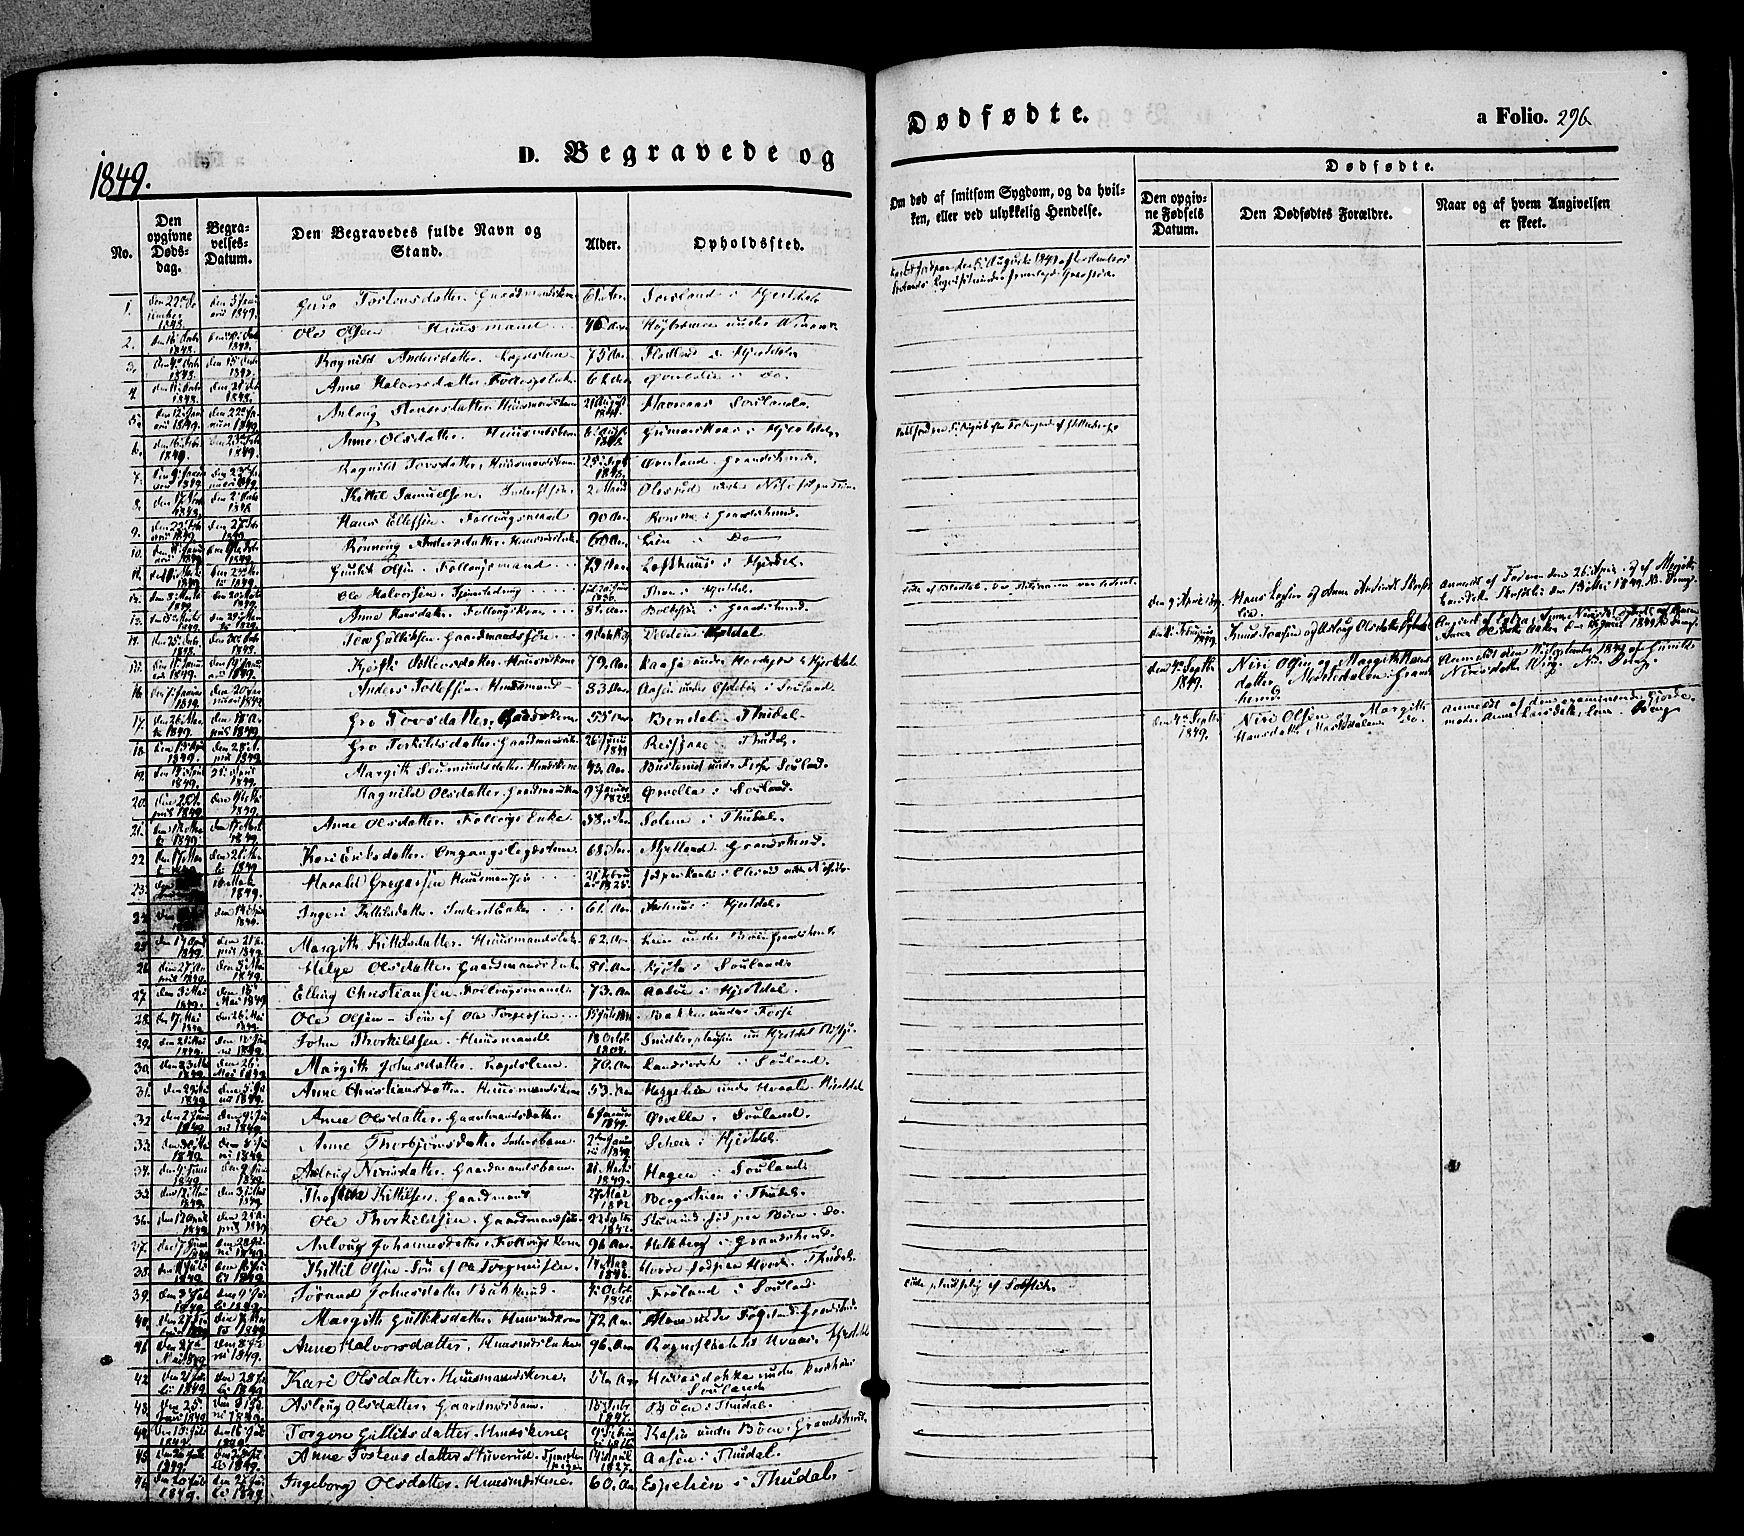 SAKO, Hjartdal kirkebøker, F/Fa/L0008: Ministerialbok nr. I 8, 1844-1859, s. 296